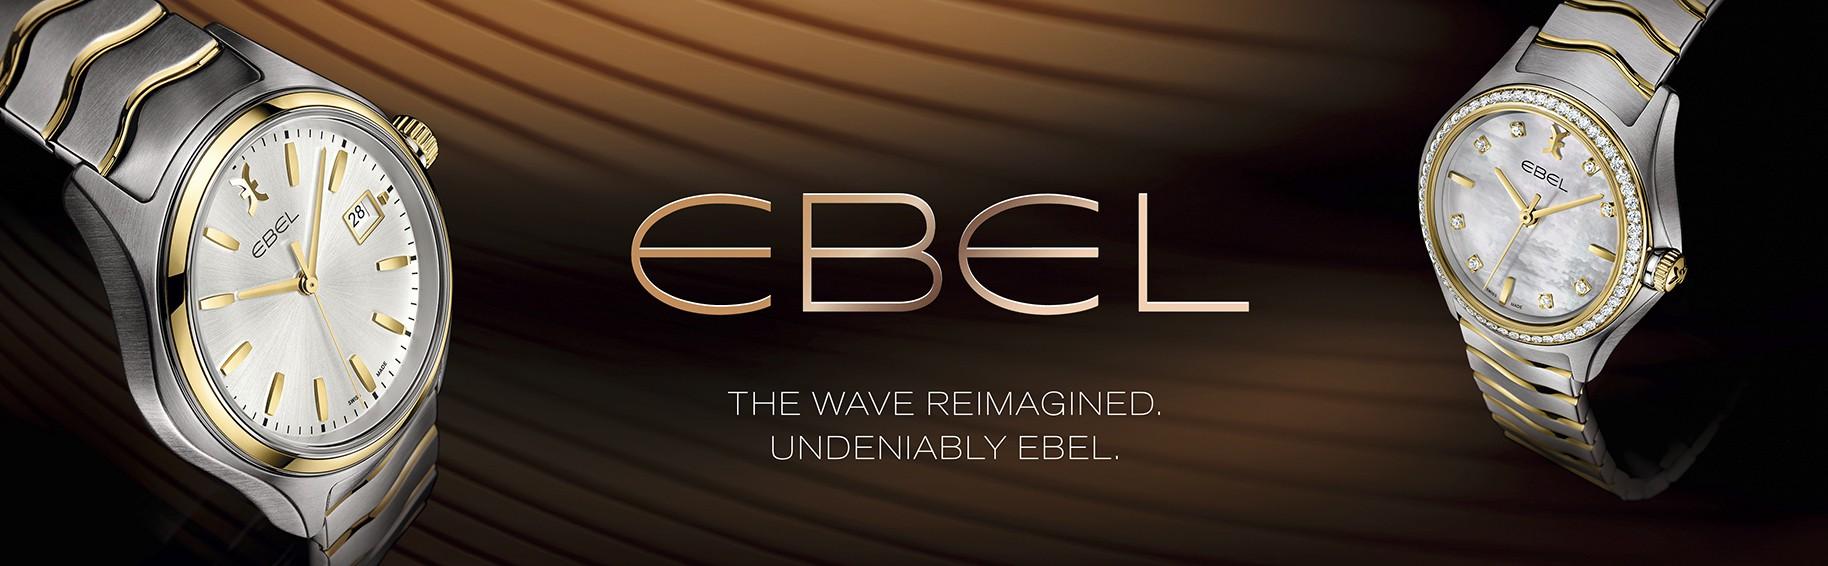 Ebel-Wave-Wolters-Emmen-Coevorden-Juweliers